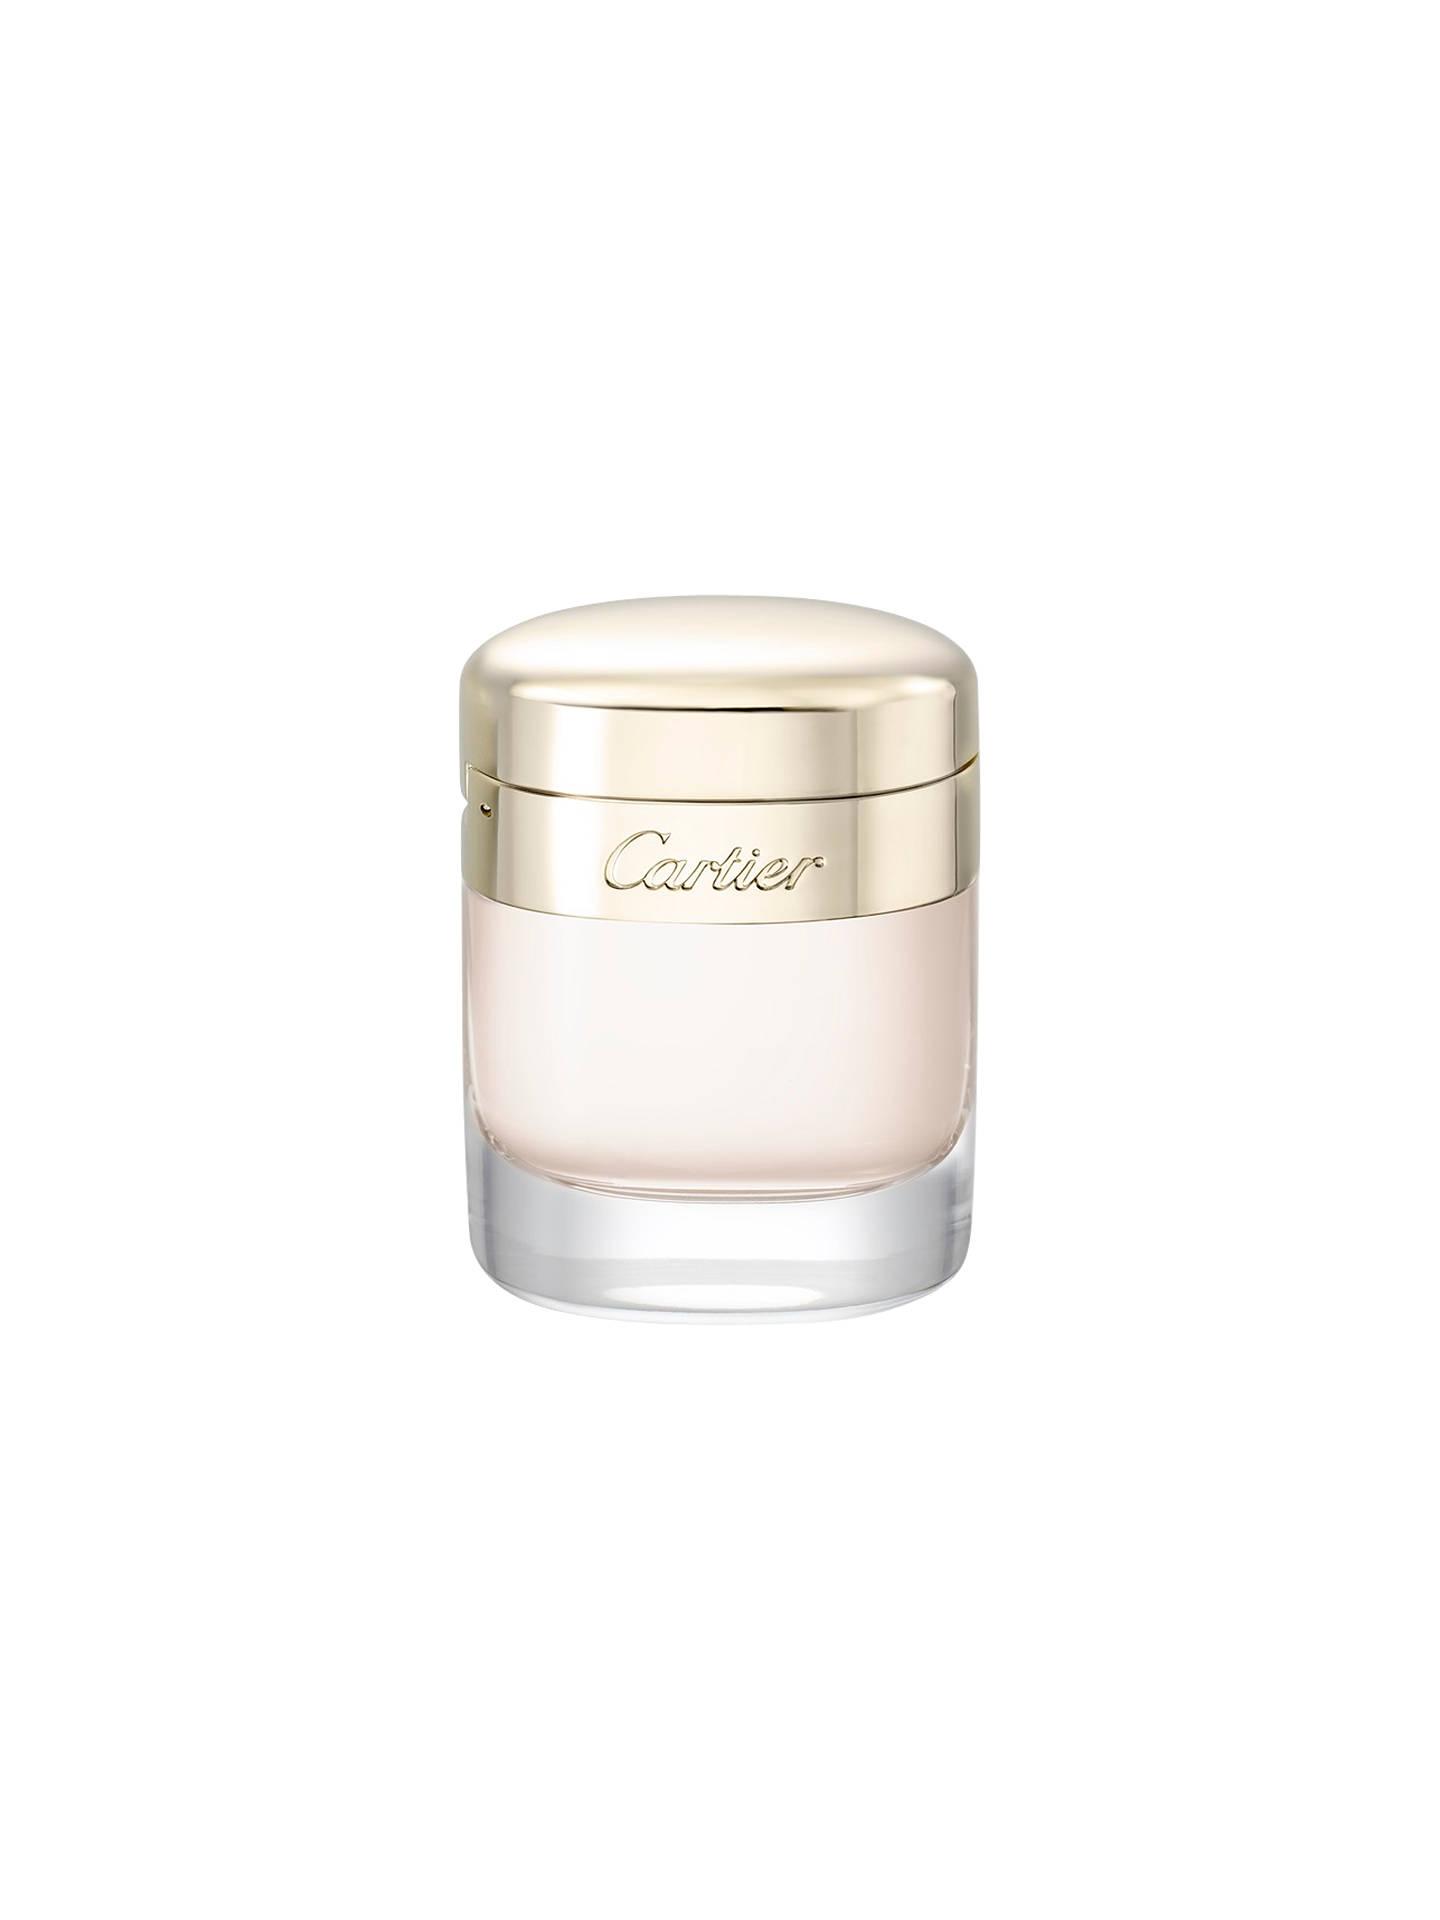 Lewisamp; De Partners Parfum Baiser Eau At Cartier John Volé OPn0kw